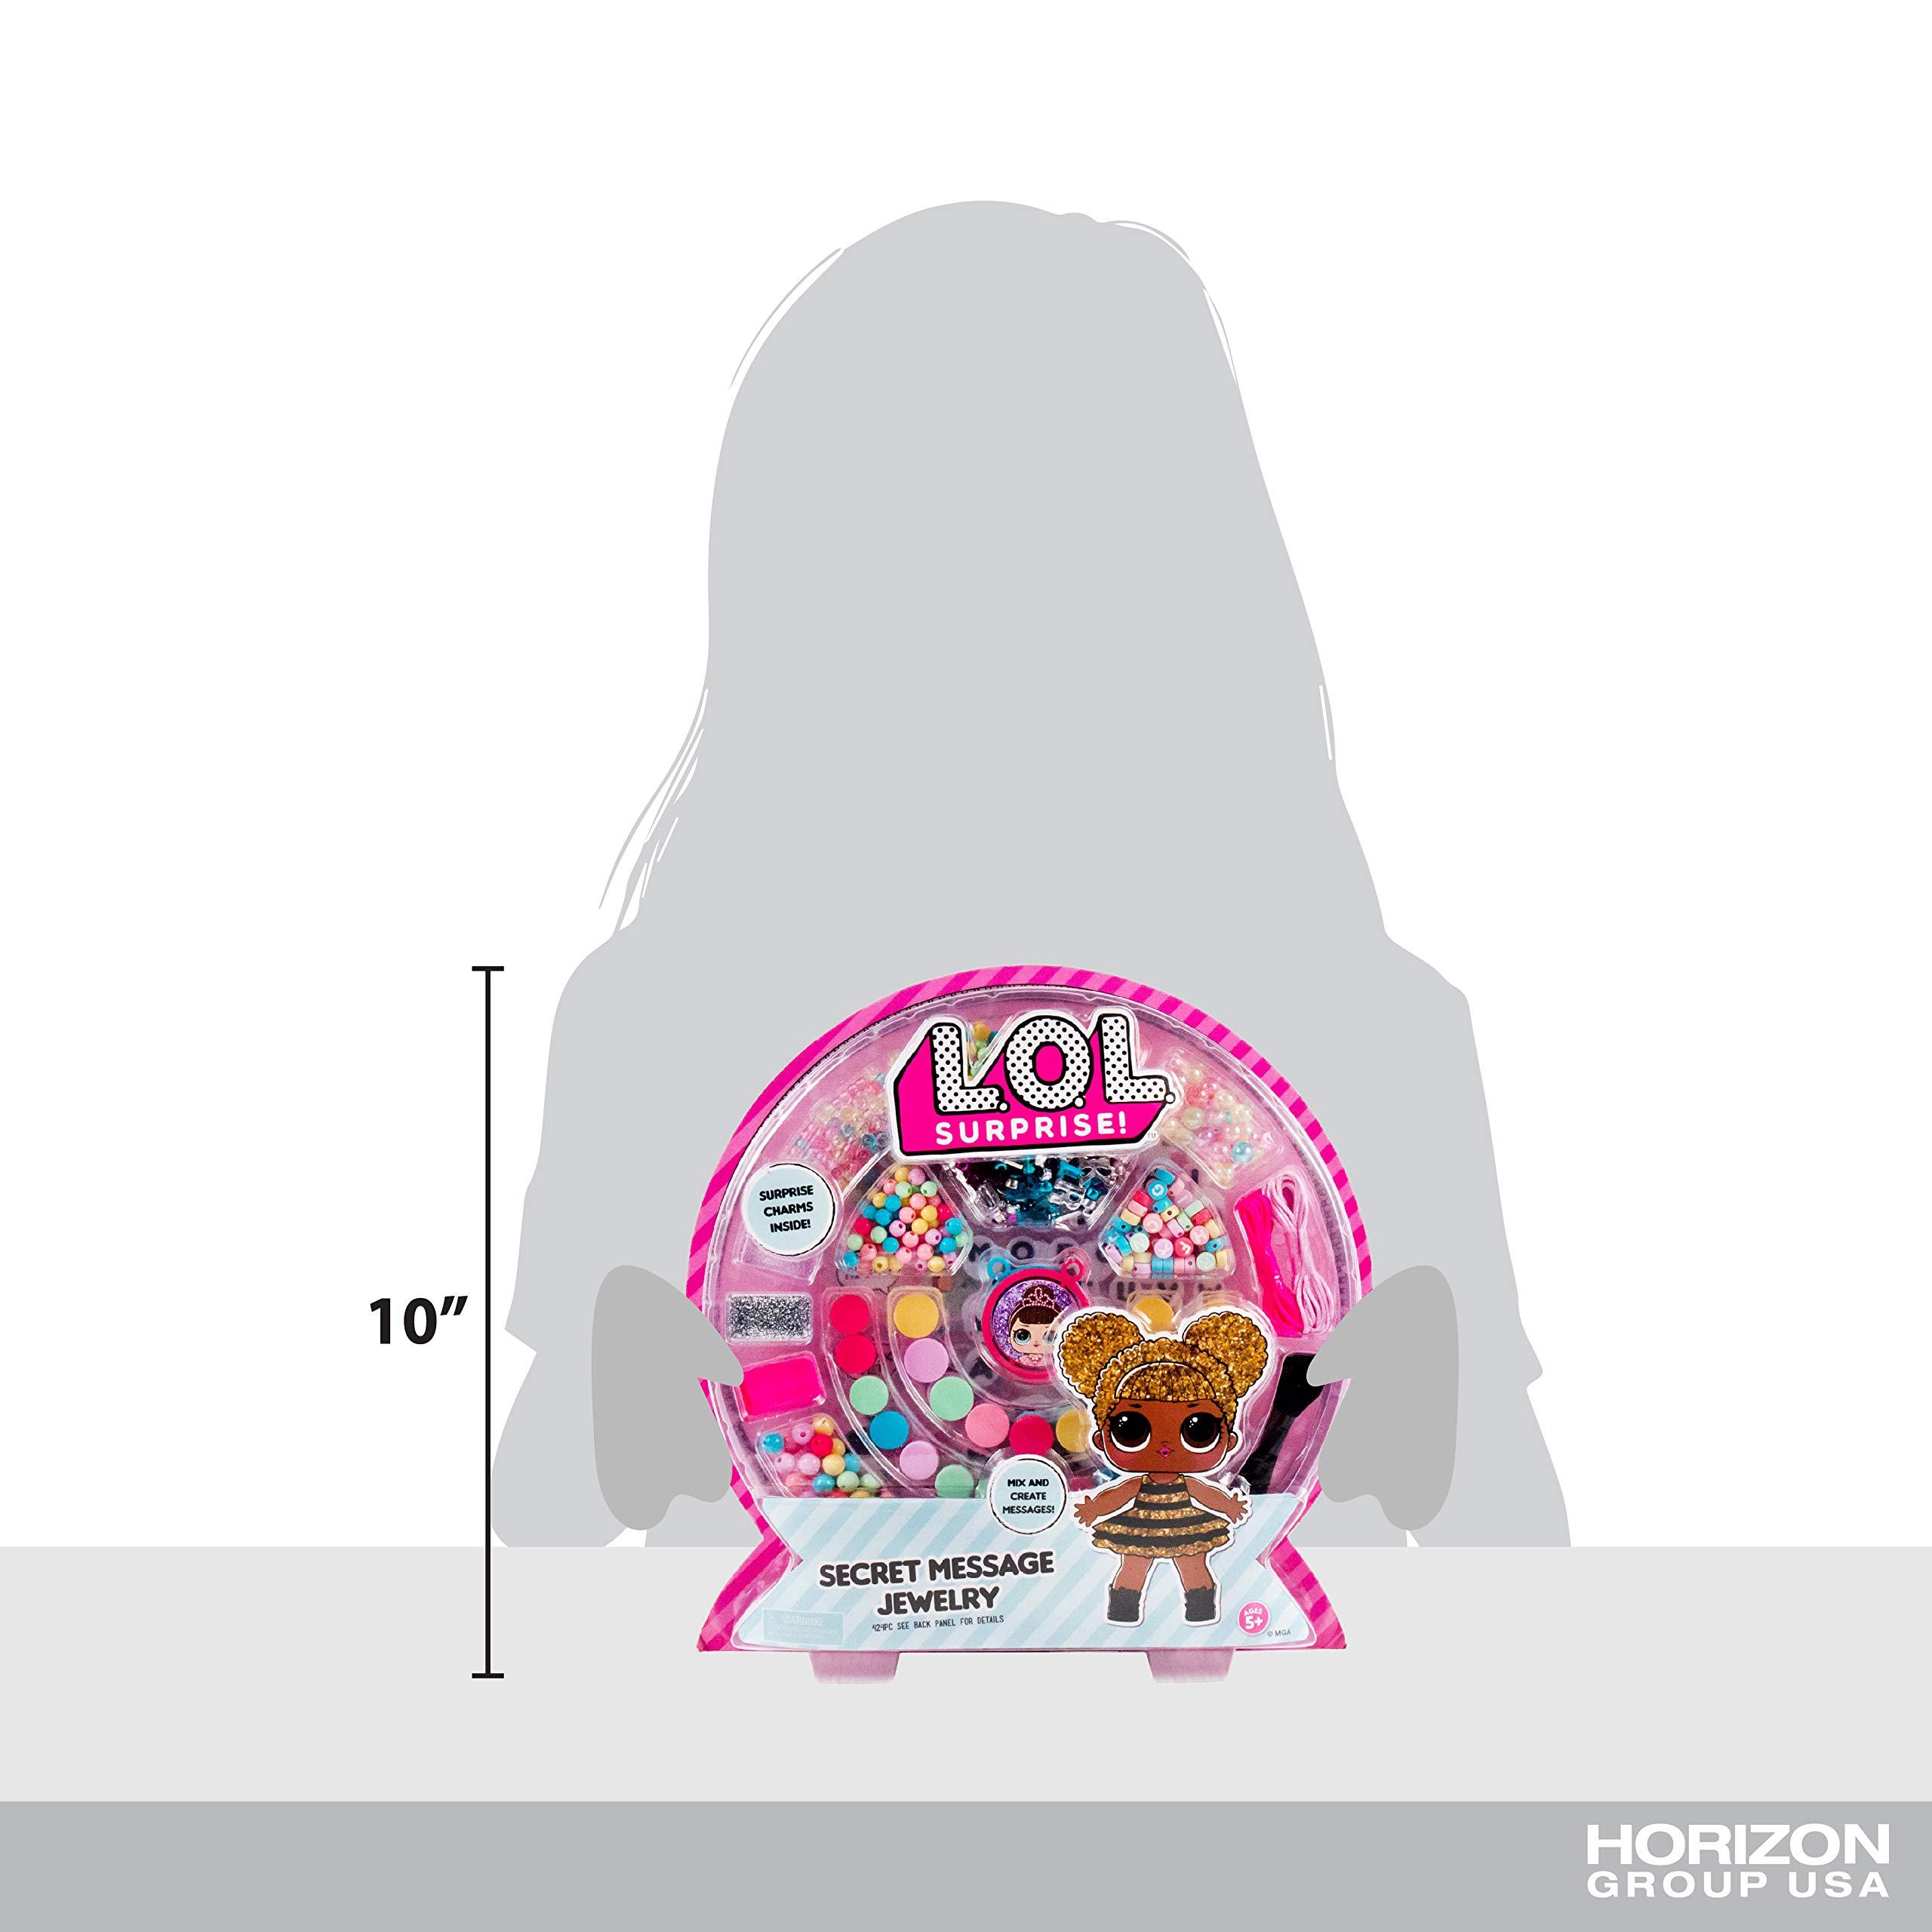 L.O.L. Surprise Secret Message Jewelry by Horizon Group USA by L.O.L. Surprise! (Image #5)